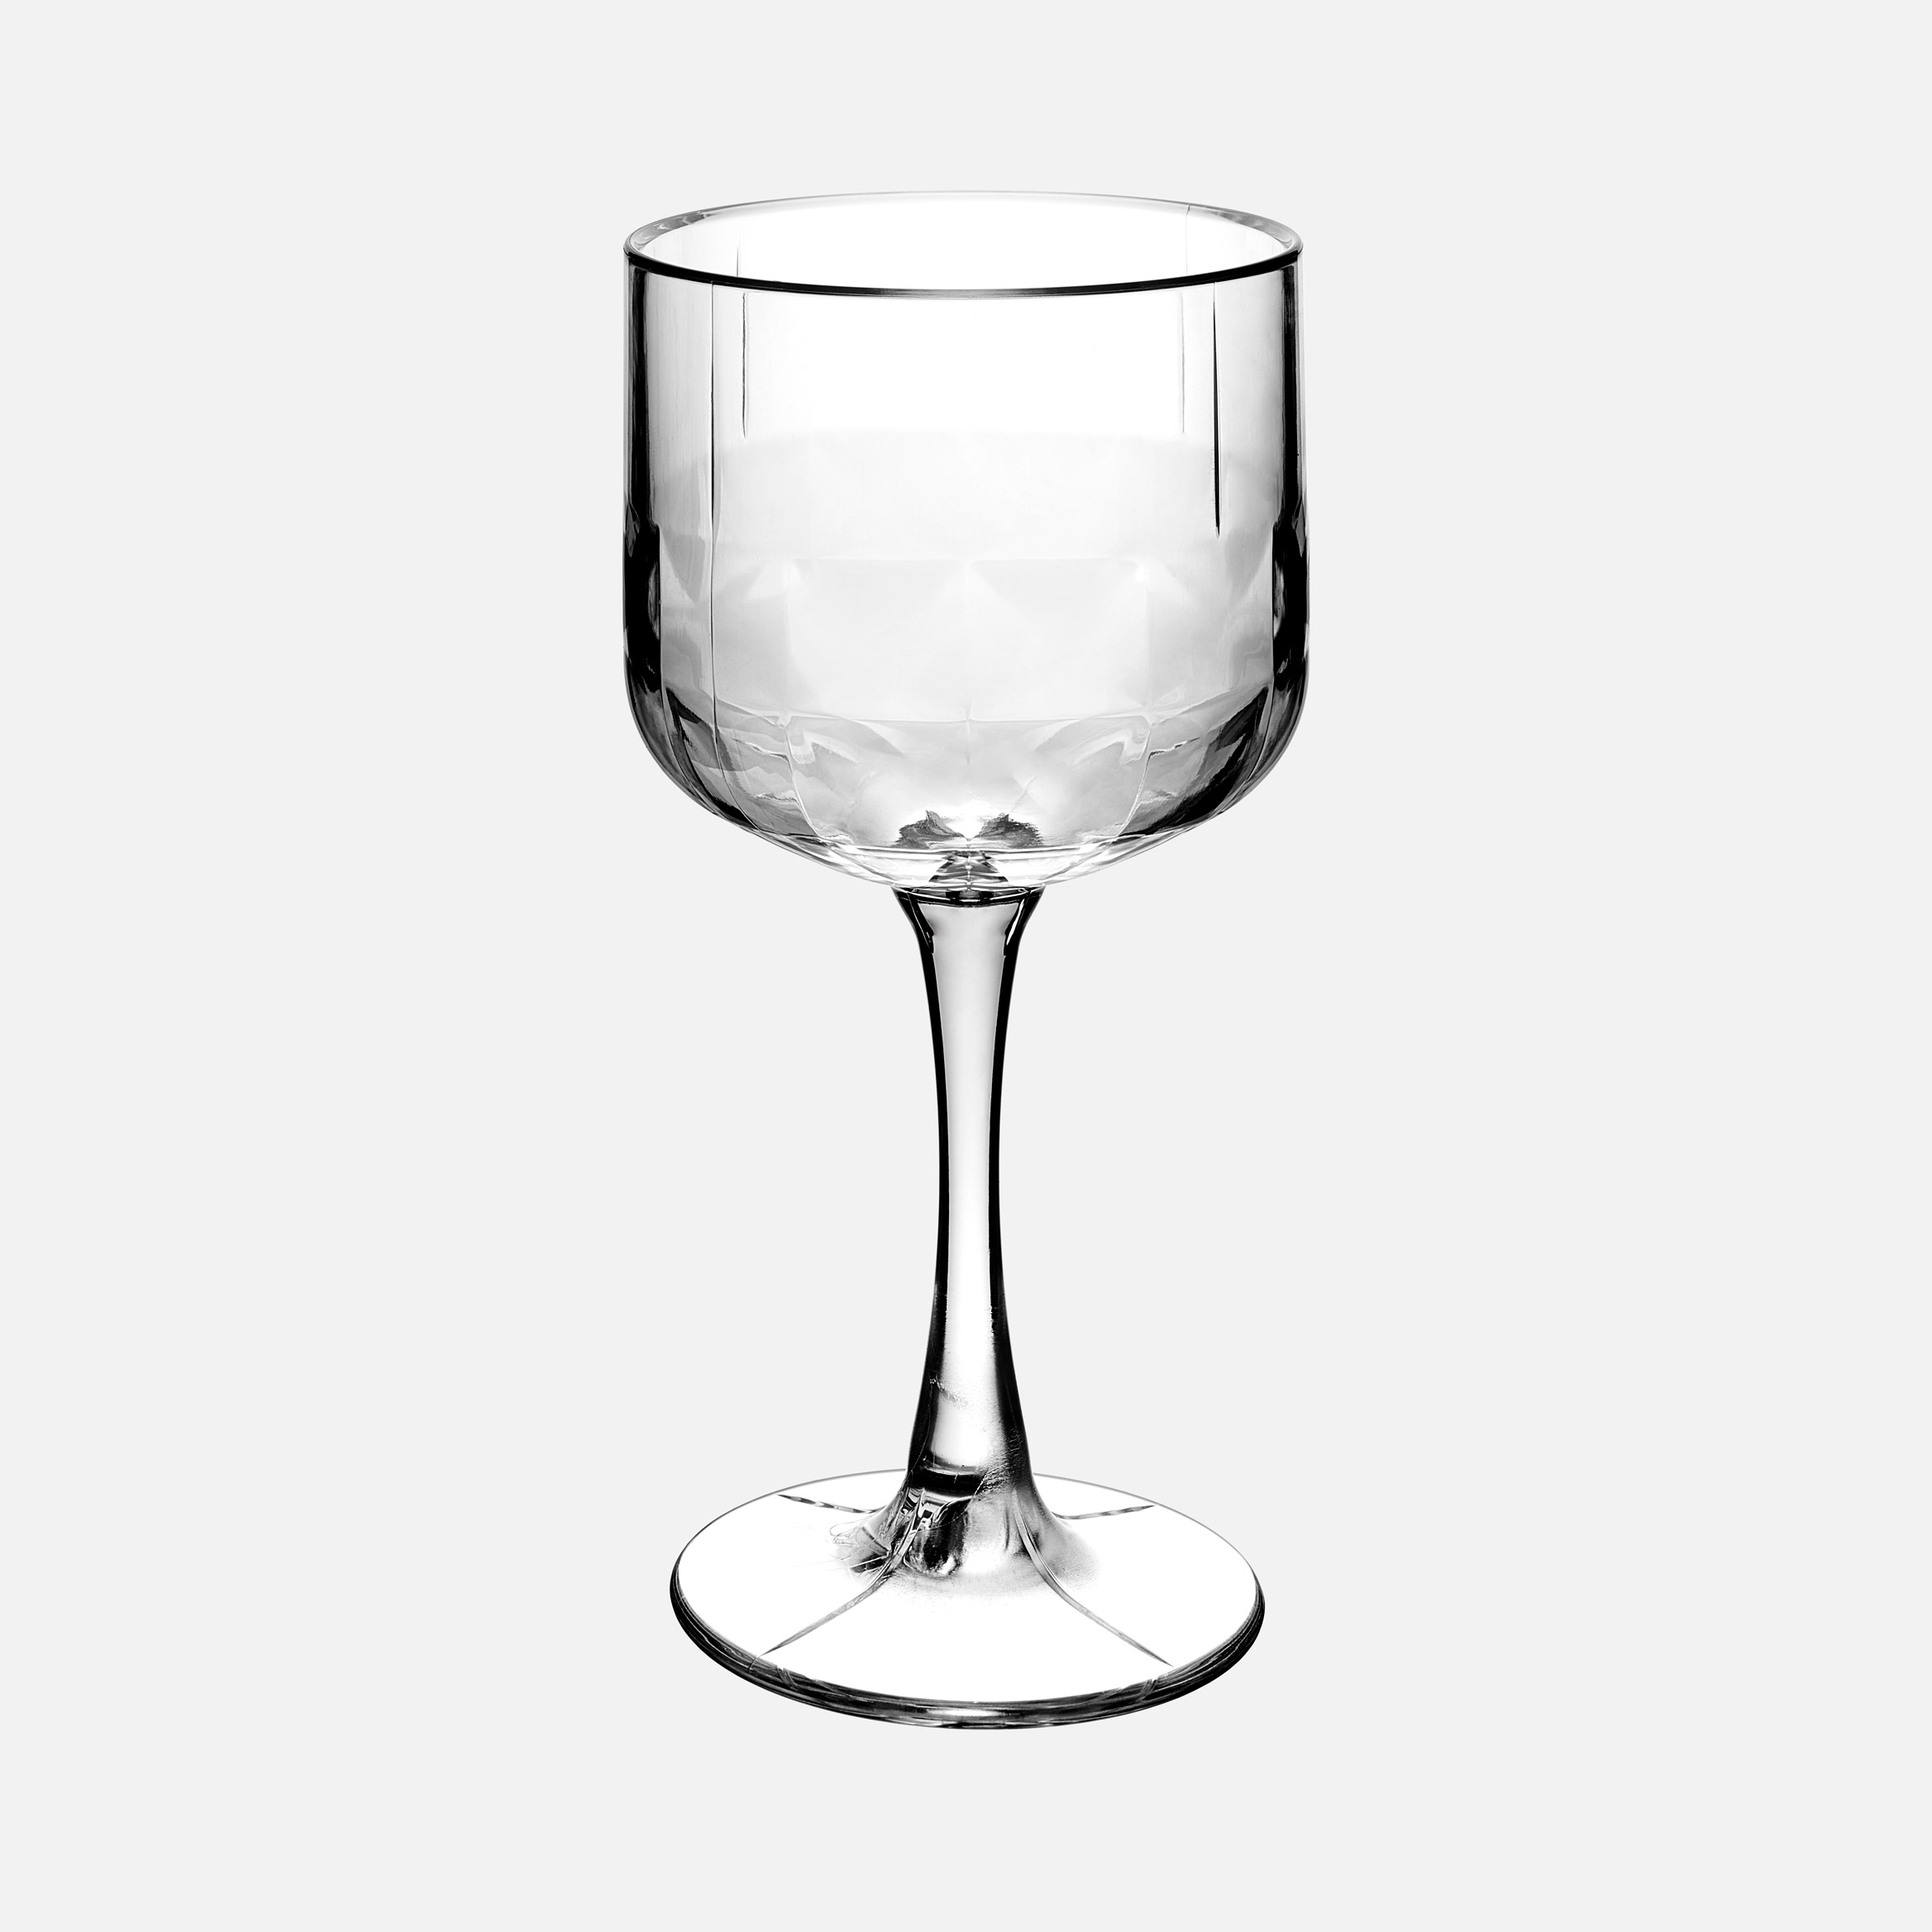 Verre Gin Mafra 500ml